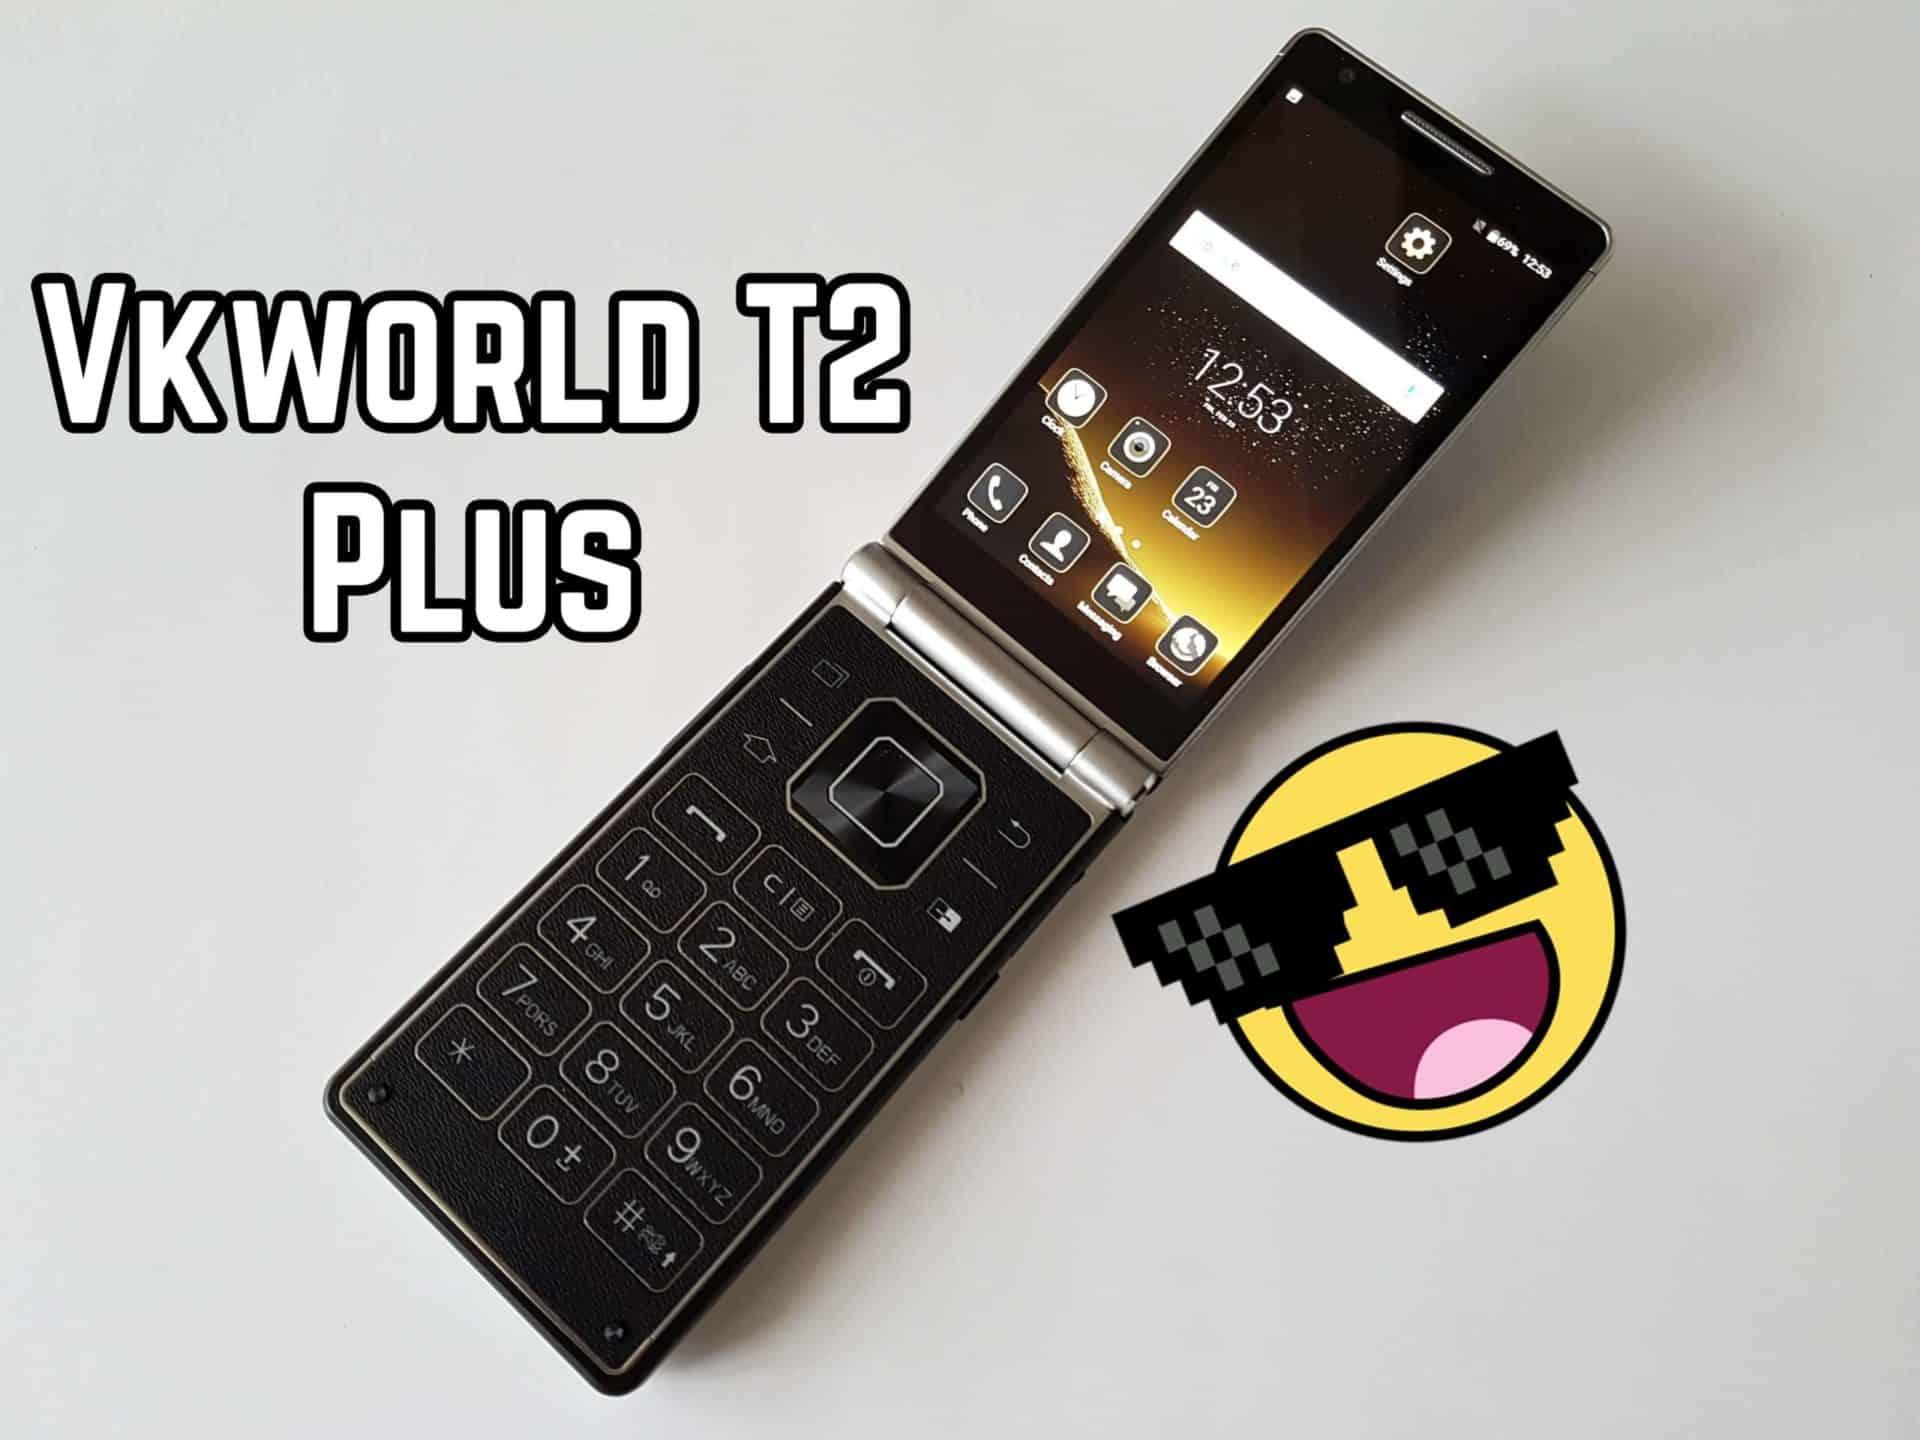 Vkworld T2 Plus review